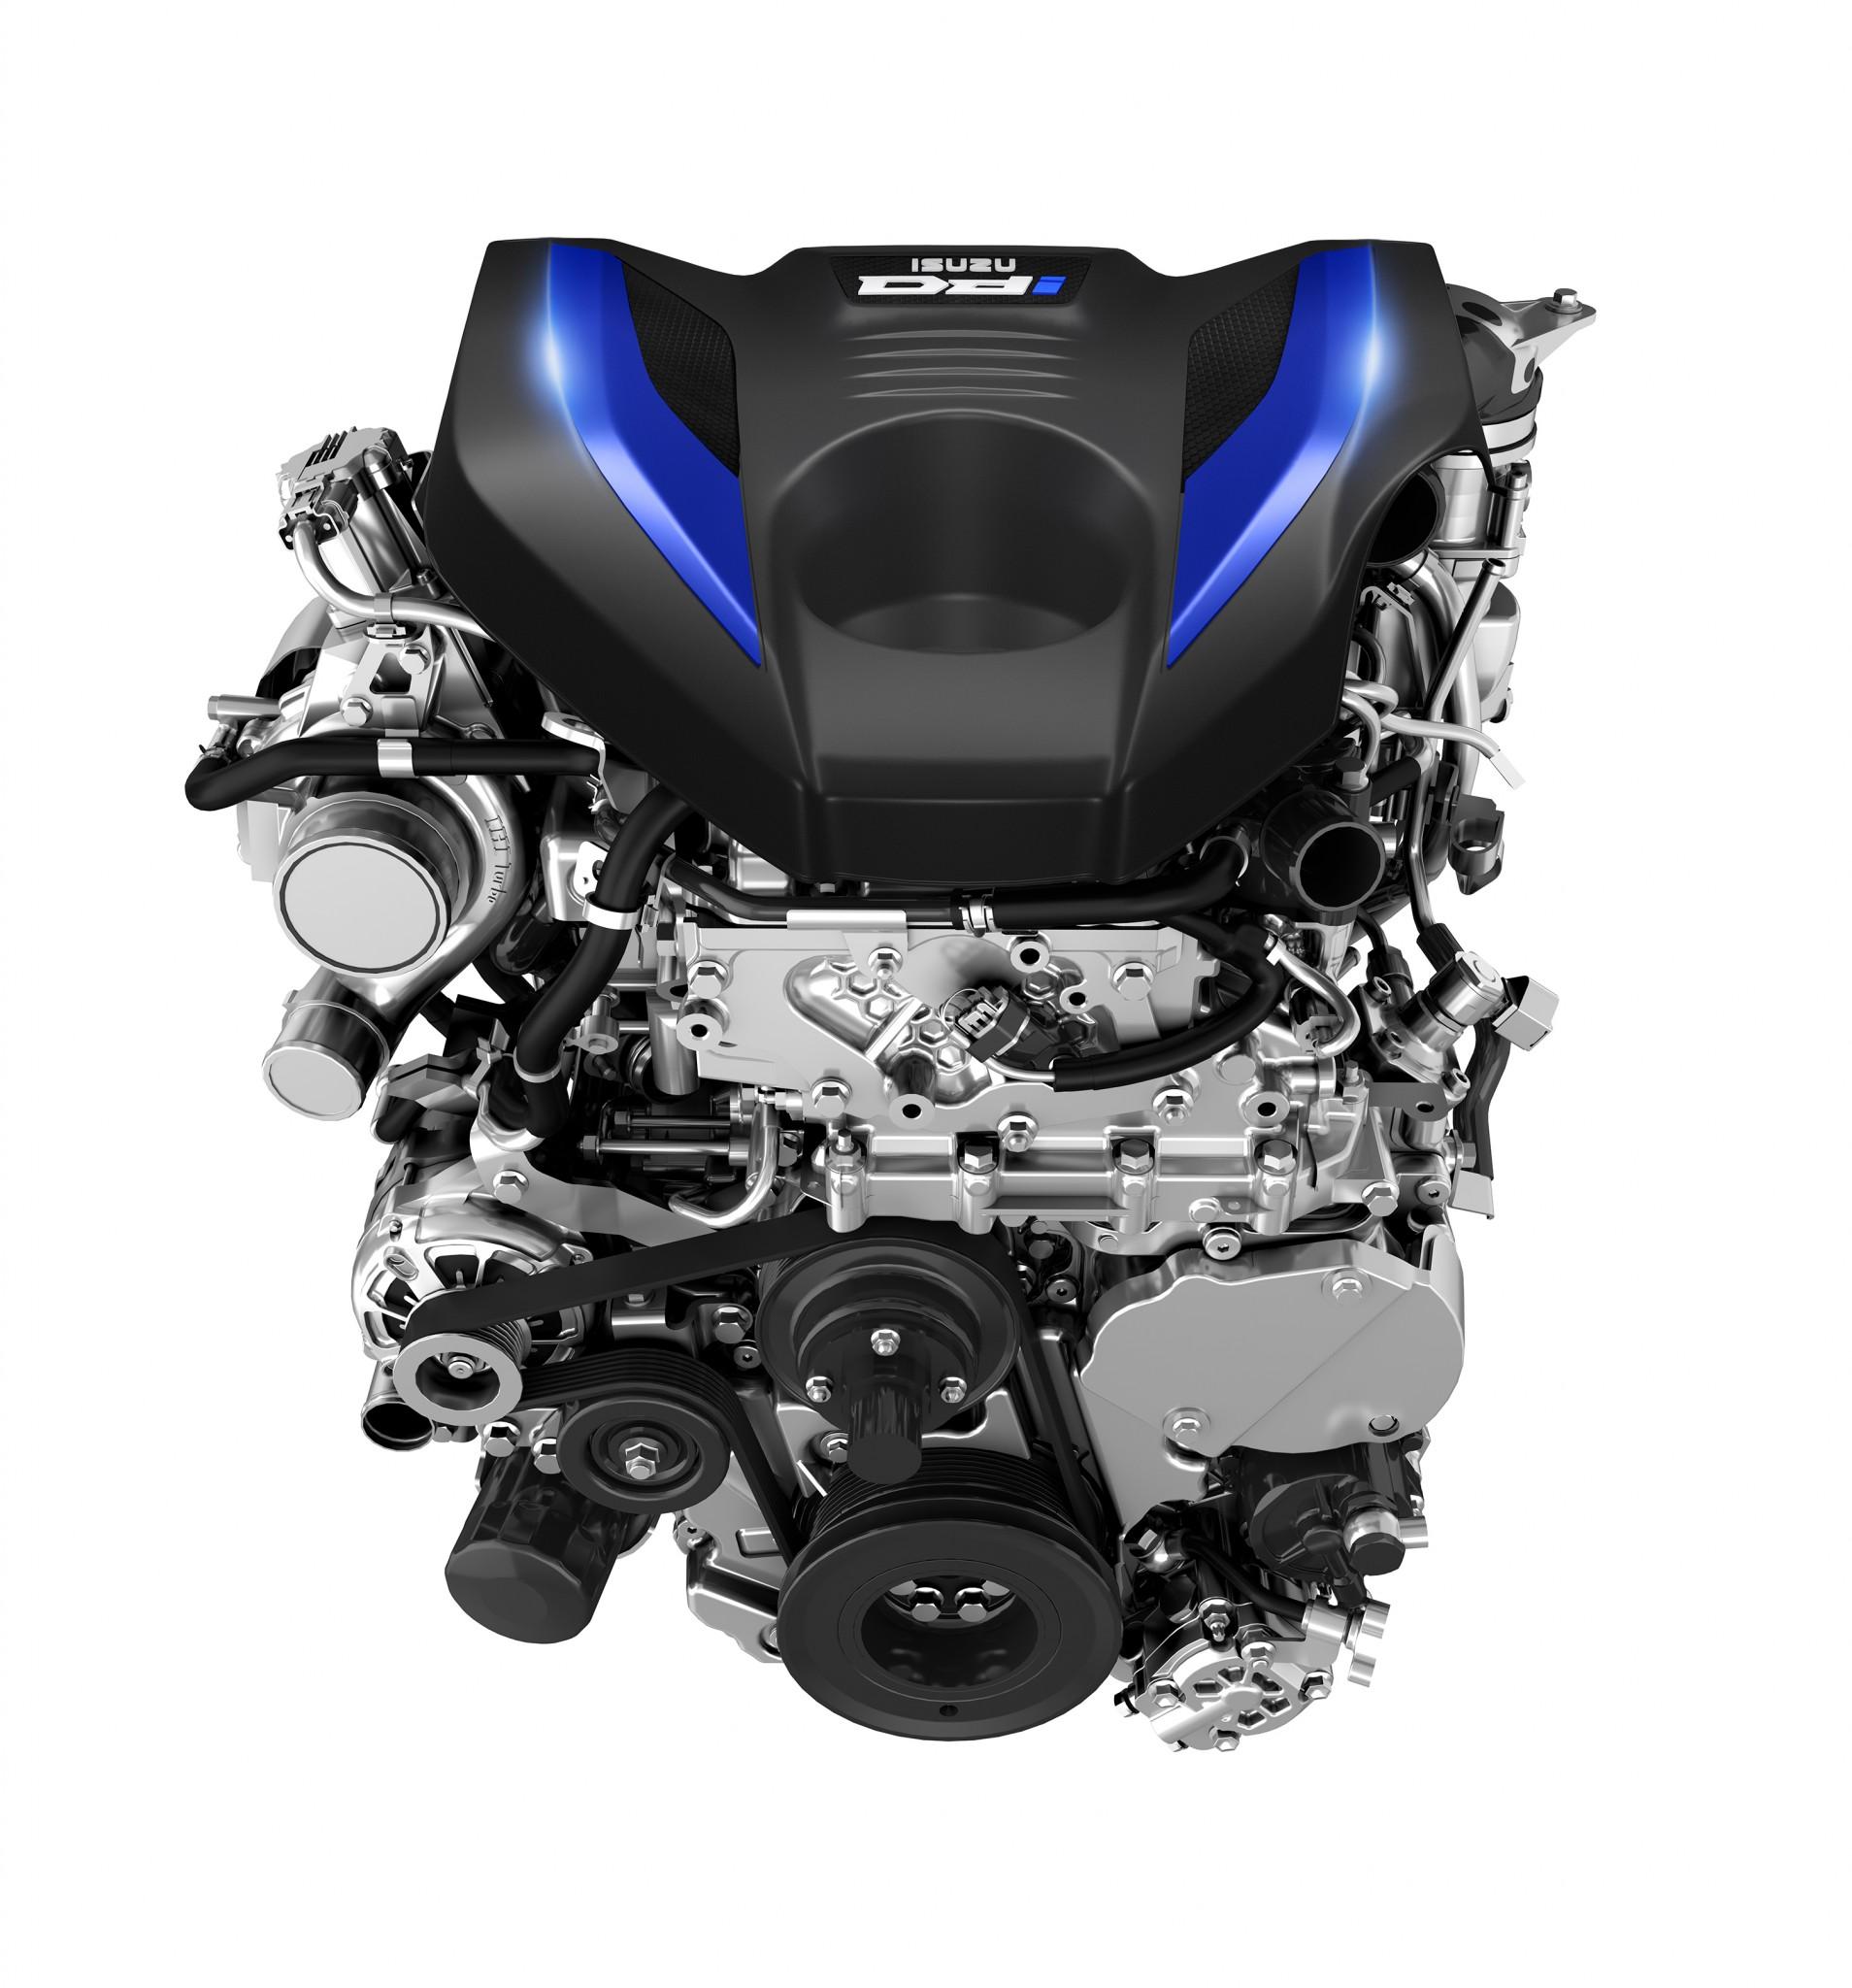 ENGINE_3.0 (1)